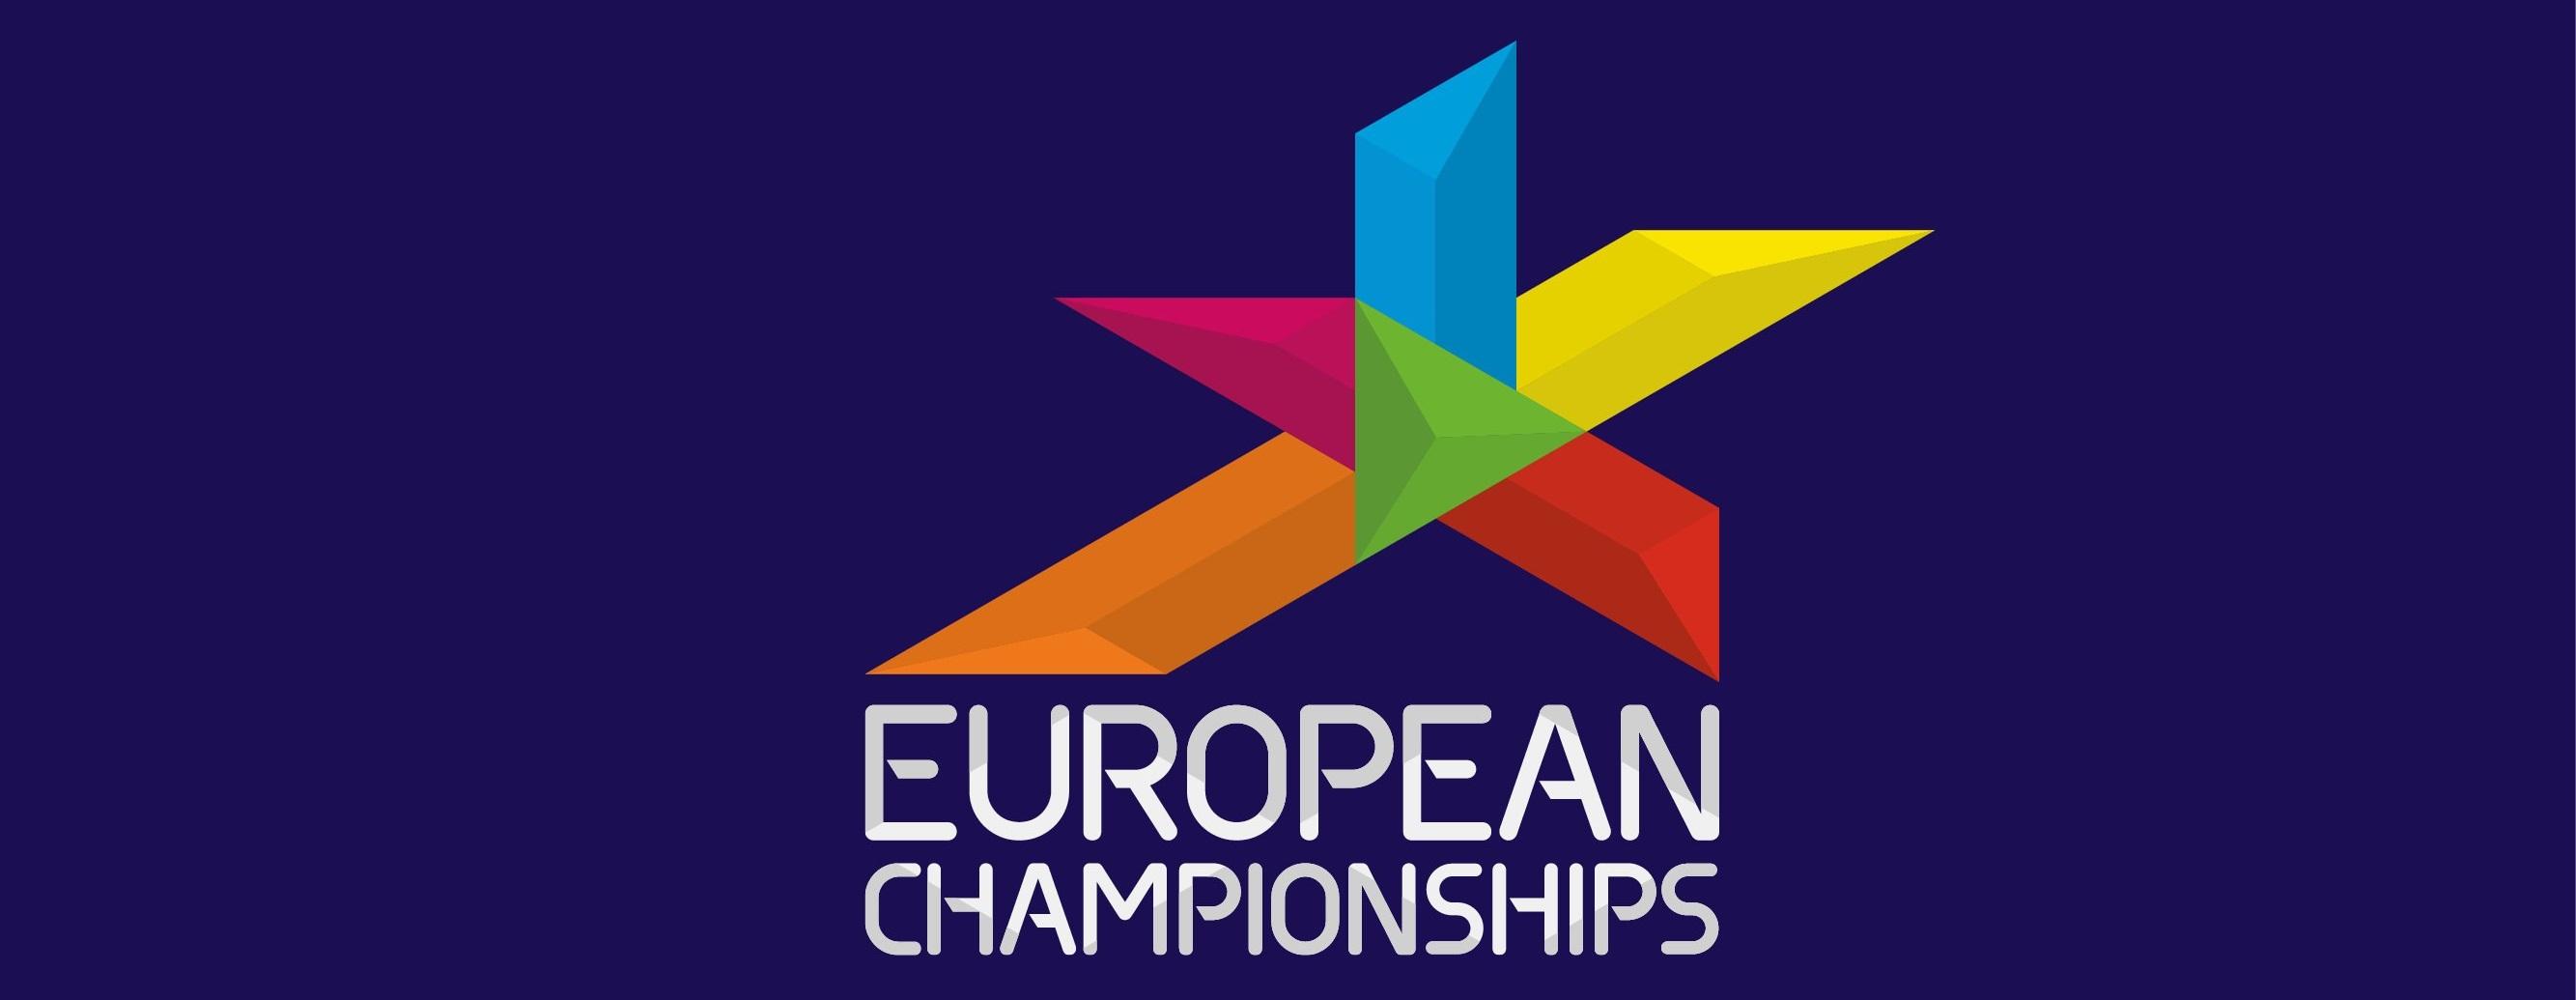 European Championships Logo